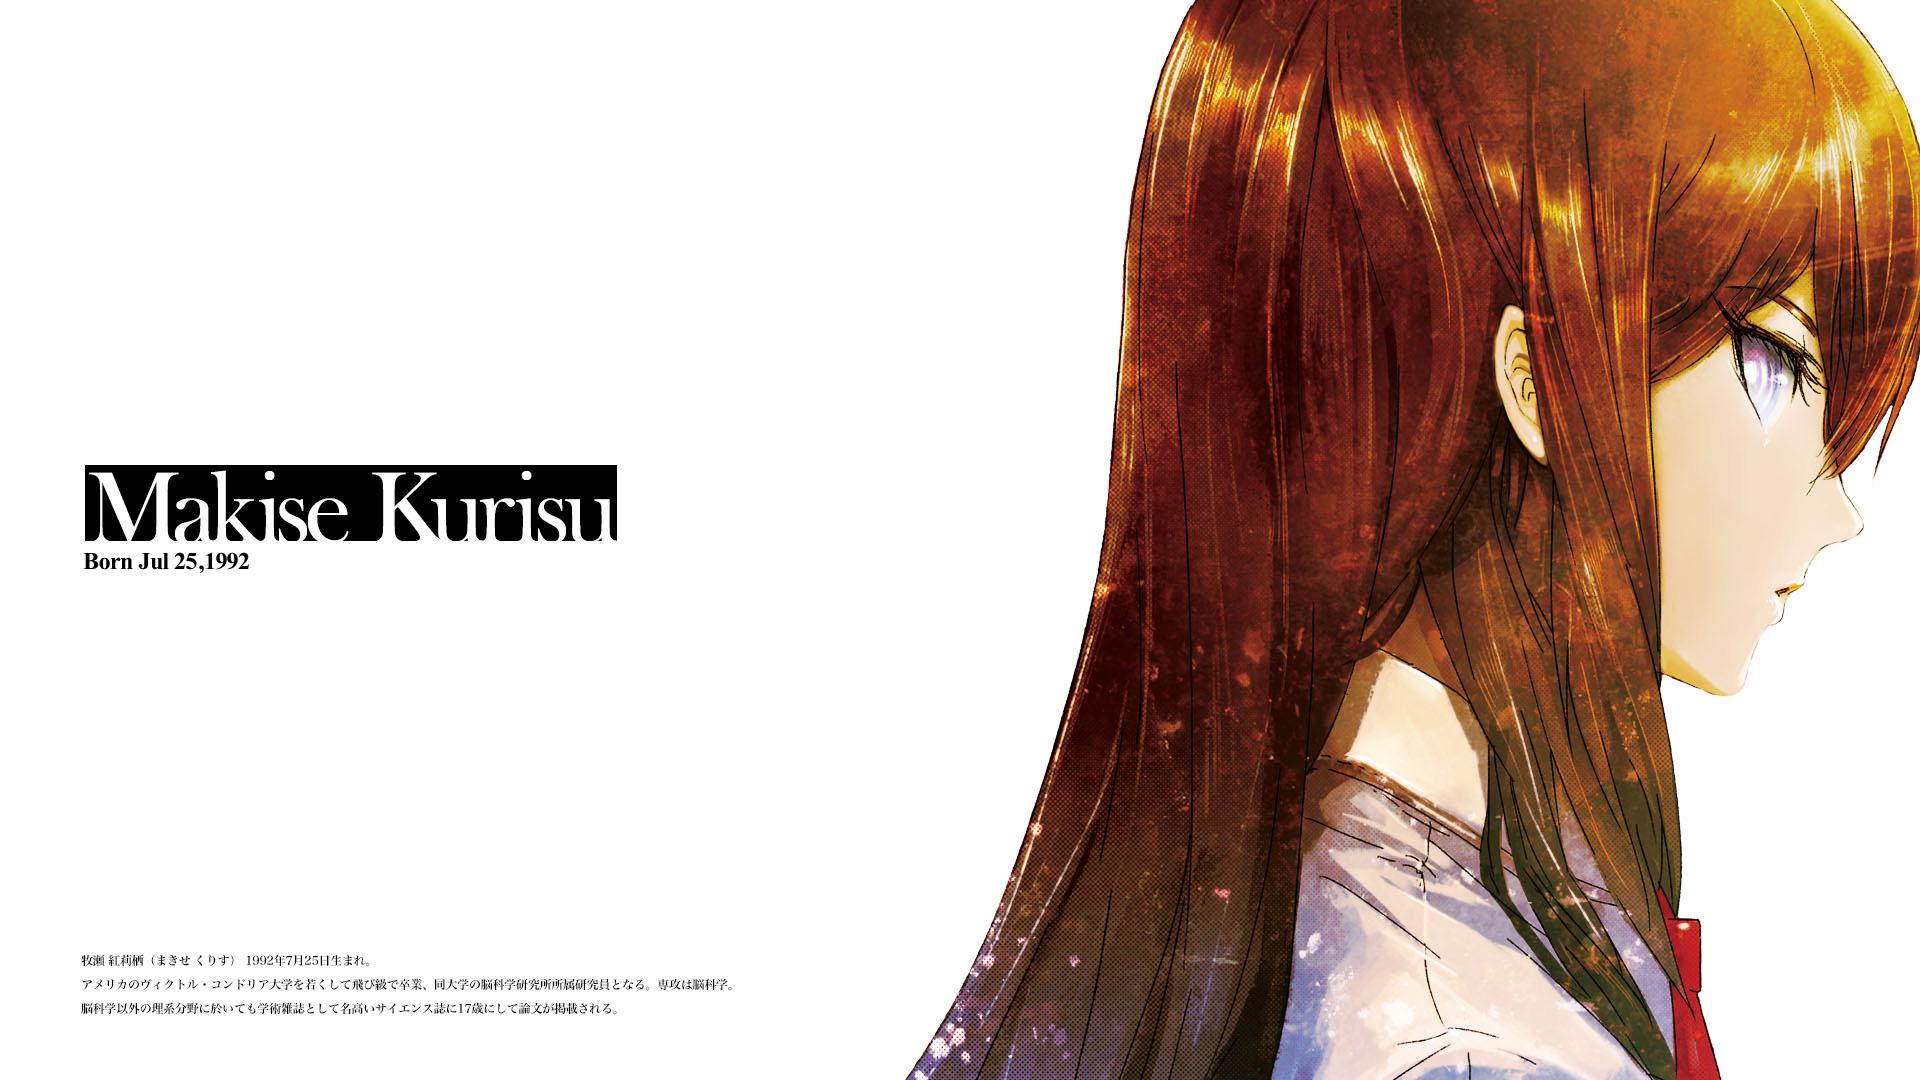 Kurisu-Makise-Steins;Gate-0-Wallpaper